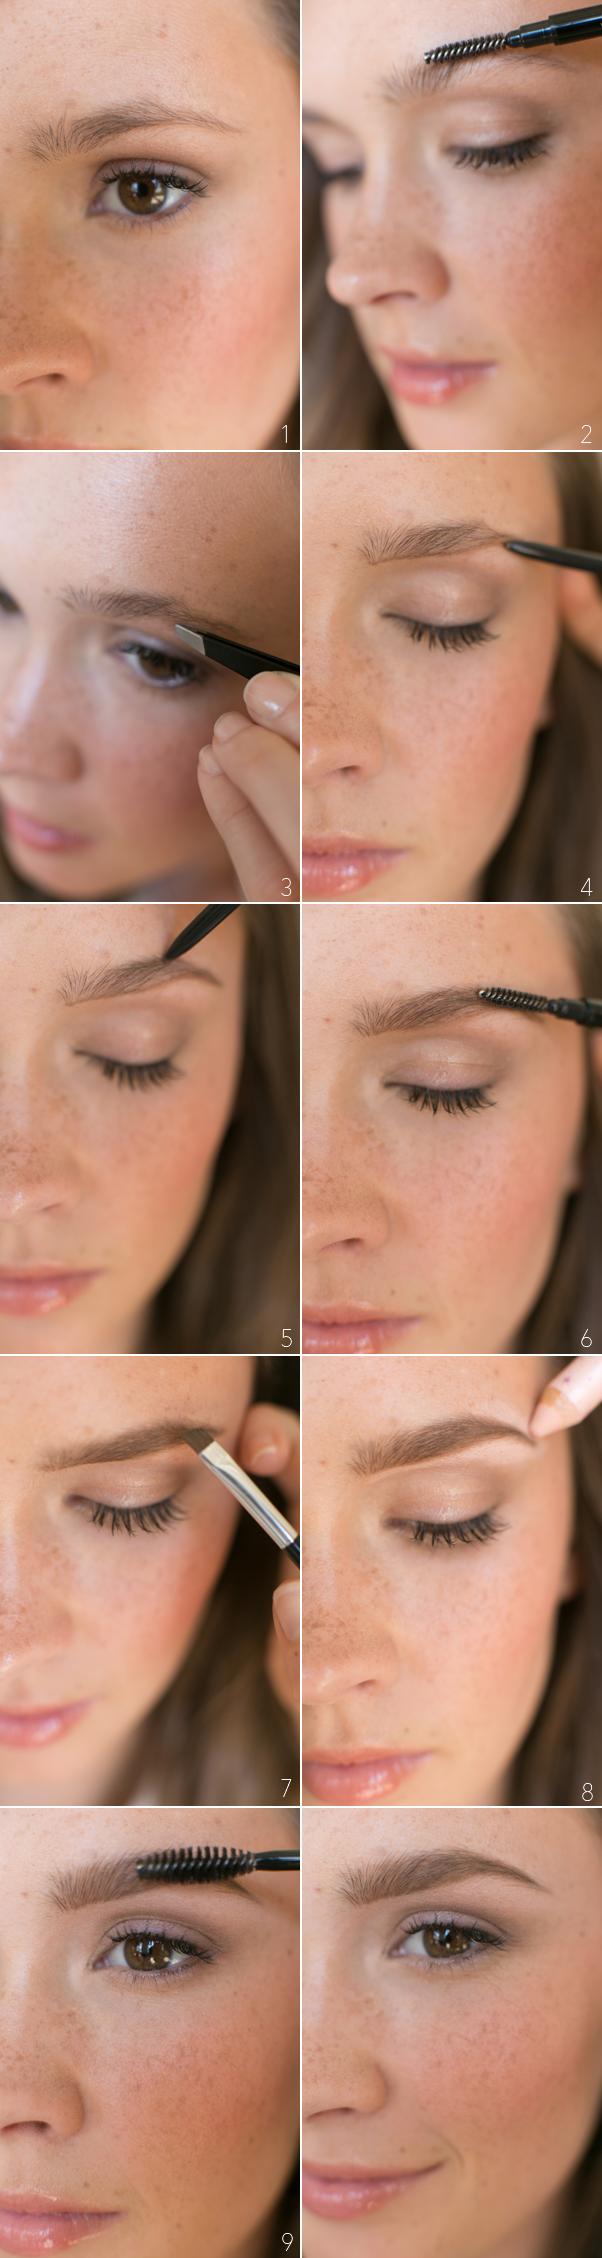 Un pequeño tutorial para resaltar tus cejas de manera natural.  Oncewed.com